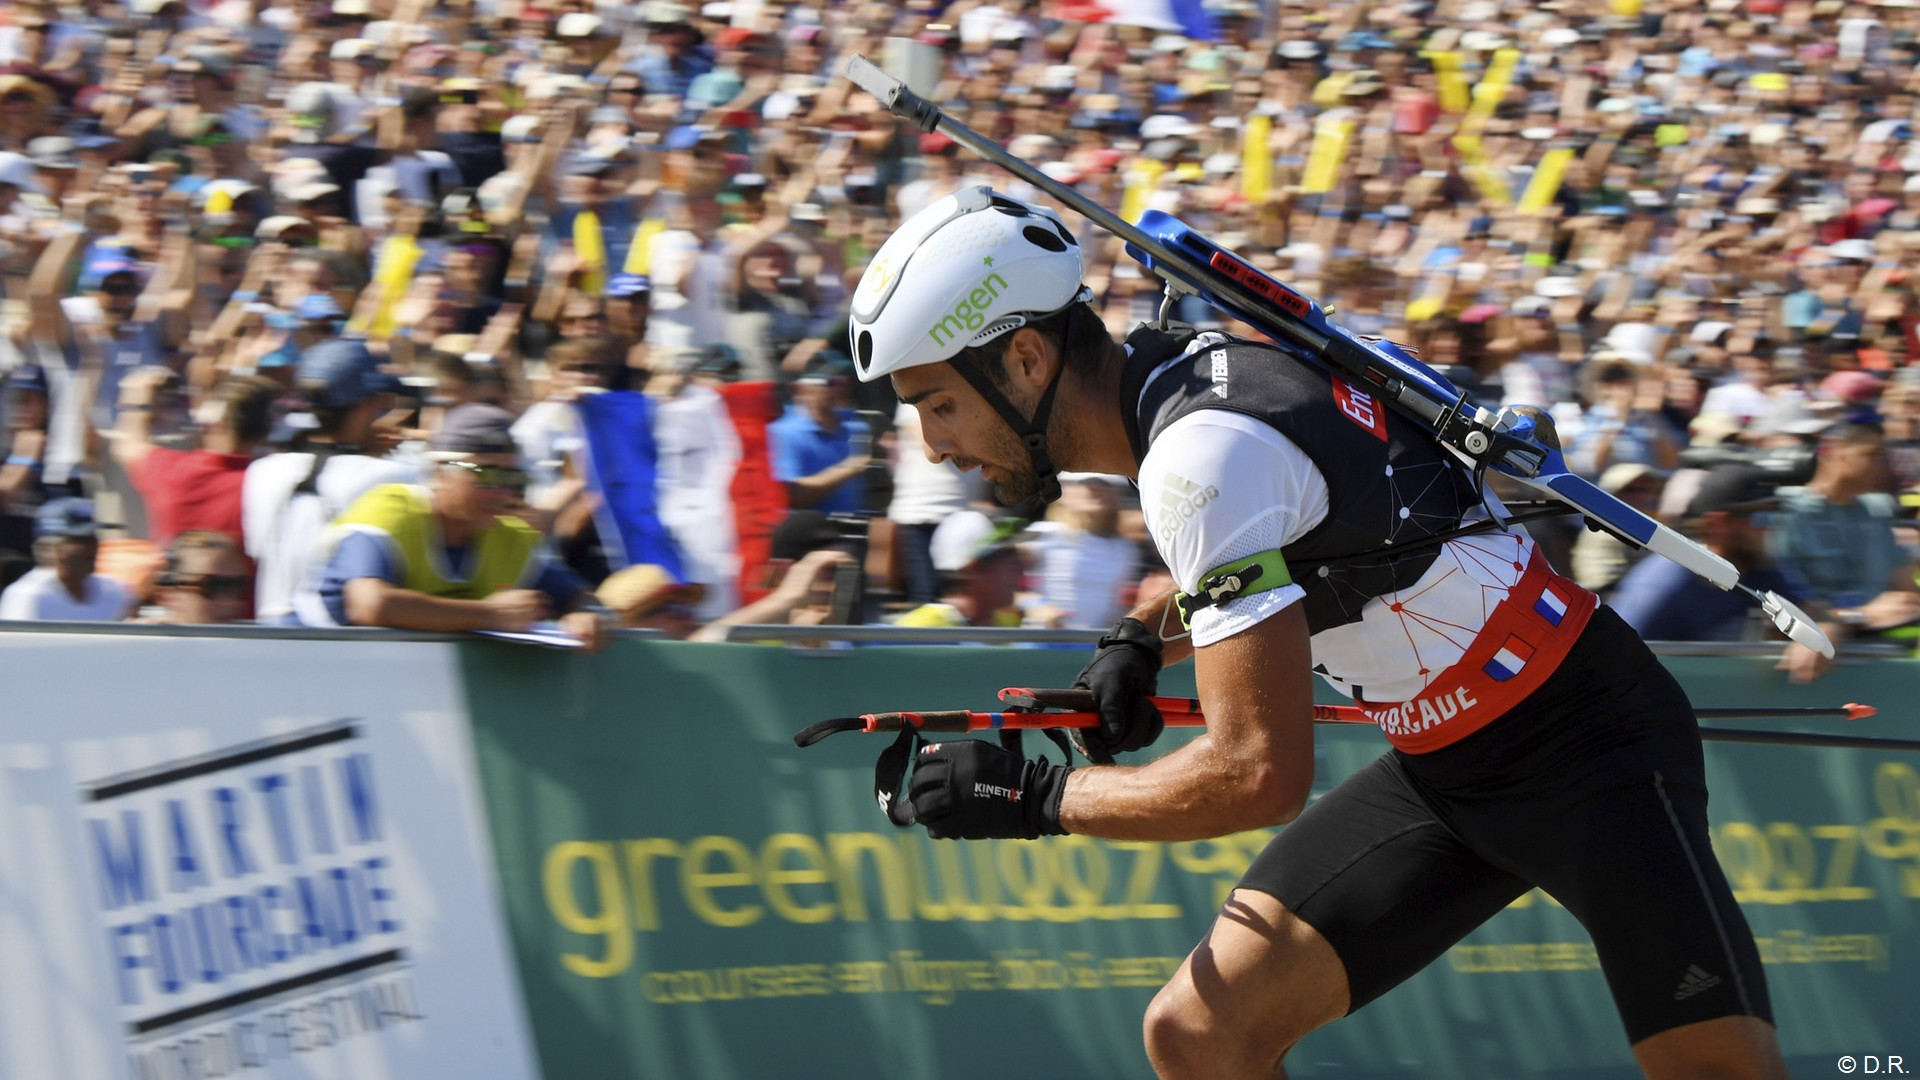 Greenweez x Martin Fourcade (biathlon) 2021